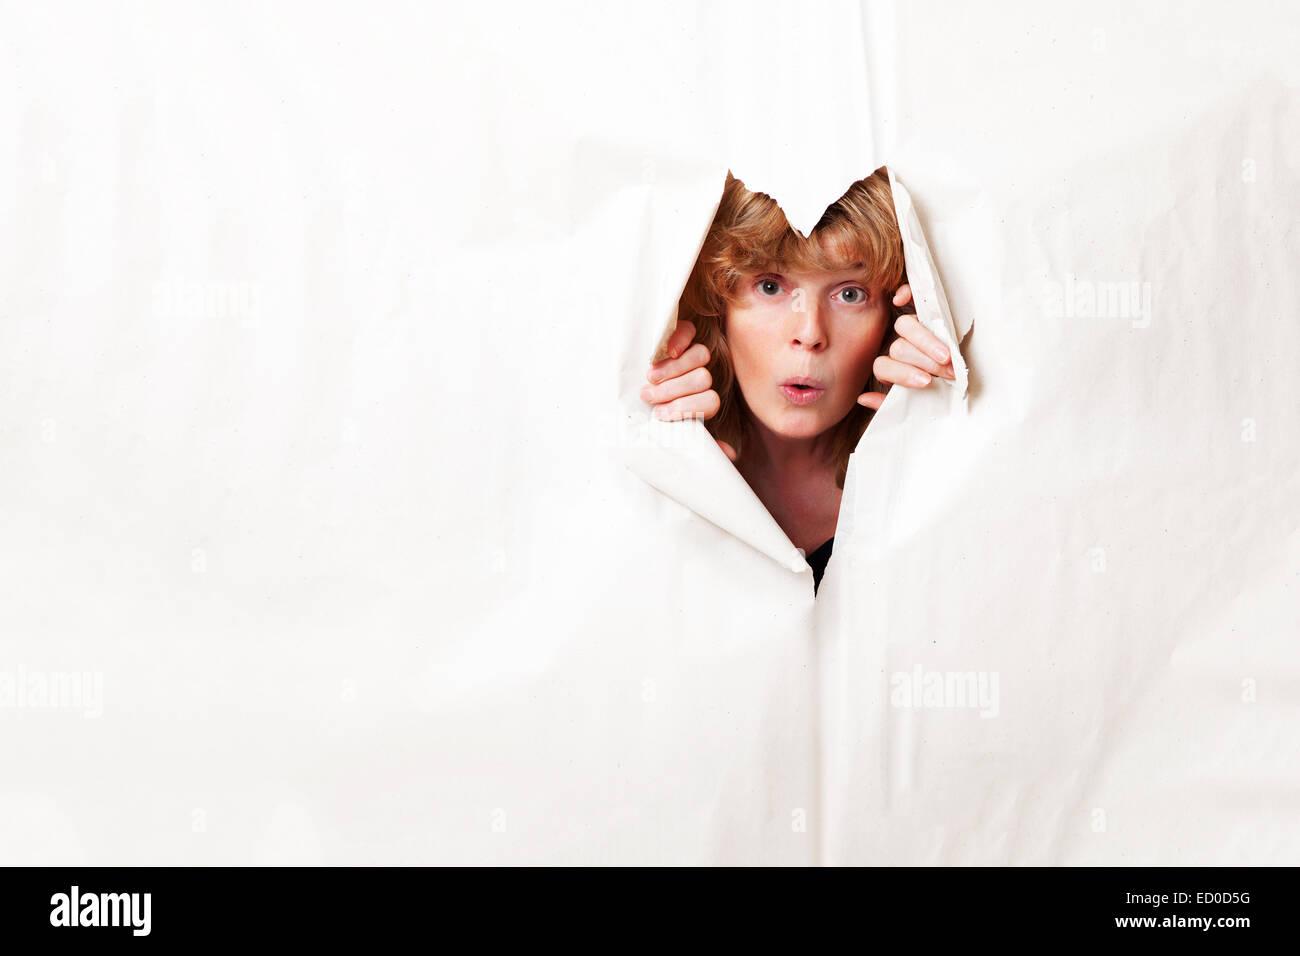 Mujer mirando a través de papel rasgado Imagen De Stock